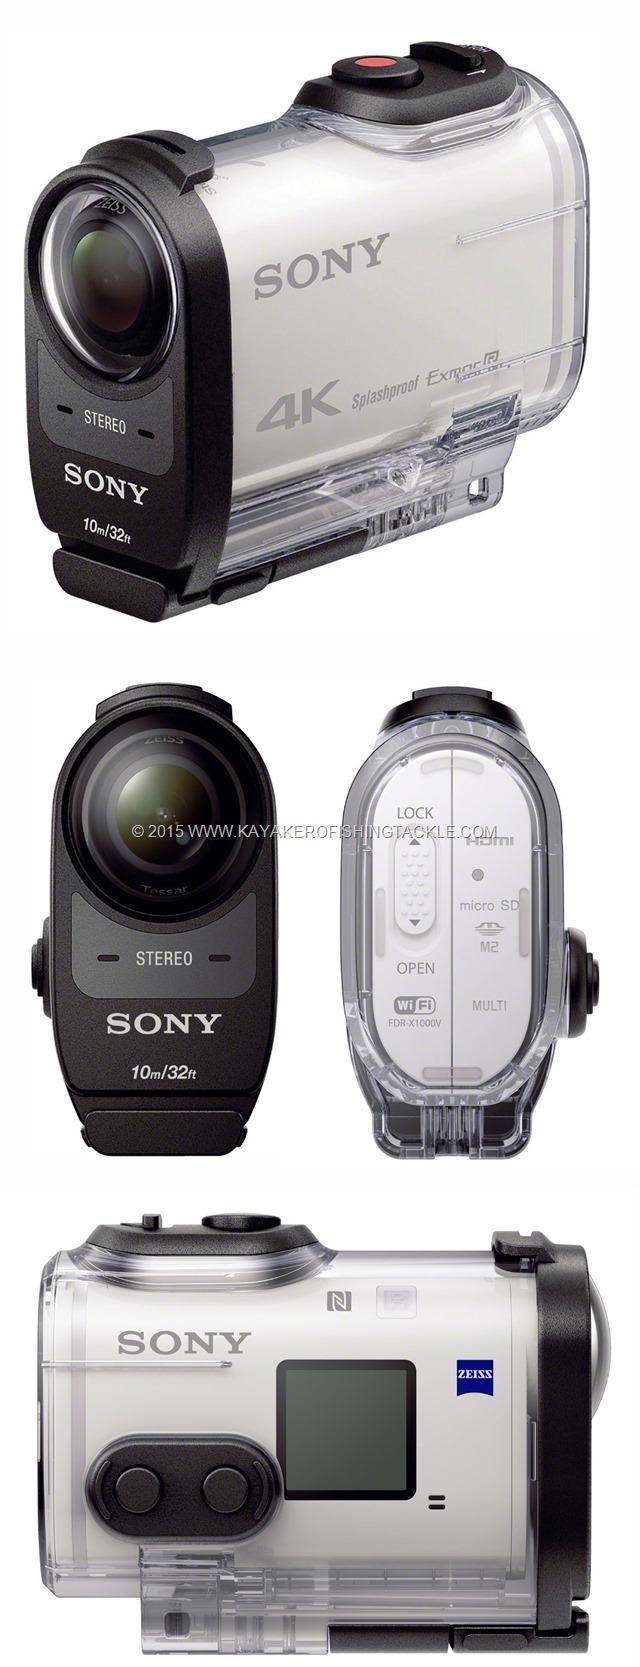 SONY-FDR-1000V-viste-globali